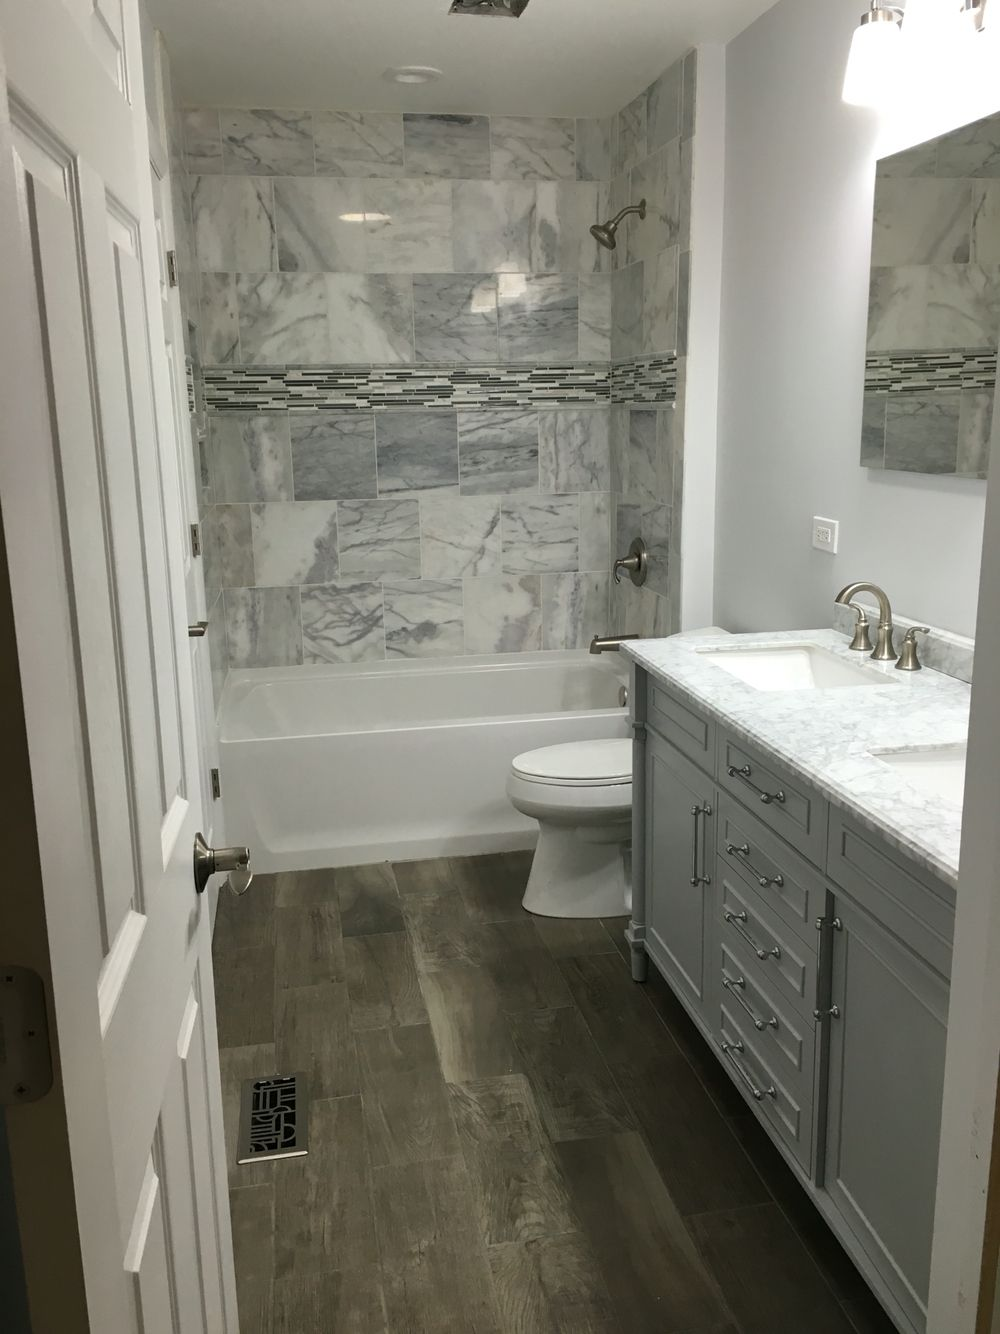 bathroom remodel small full bathroom full bathroom on bathroom renovation ideas for small bathrooms id=13546